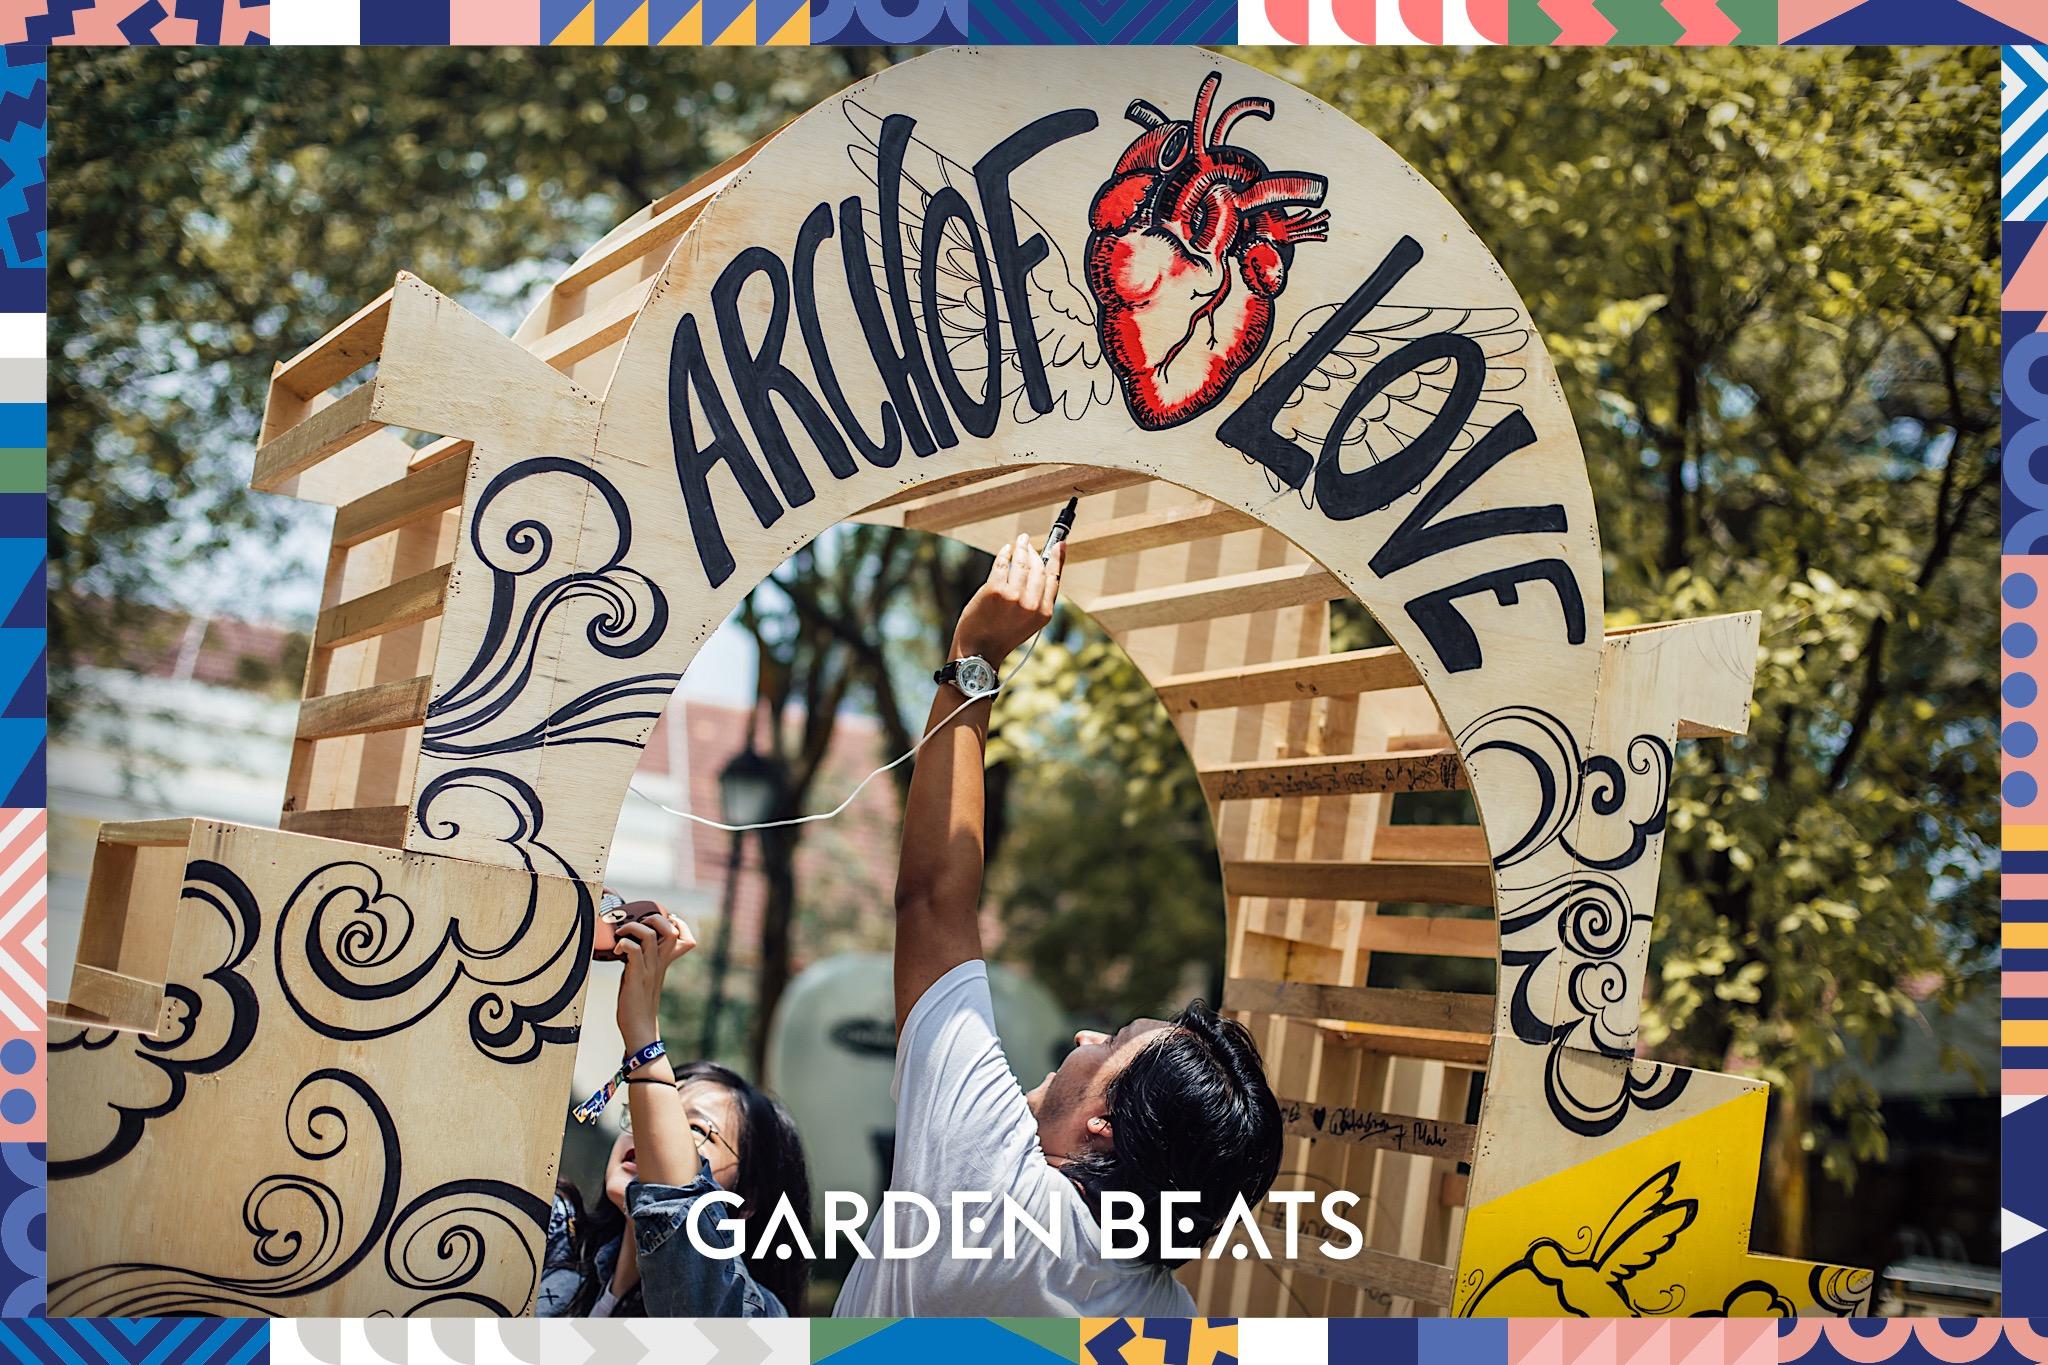 18032017_GardenBeats_Colossal117_WatermarkedGB.jpg